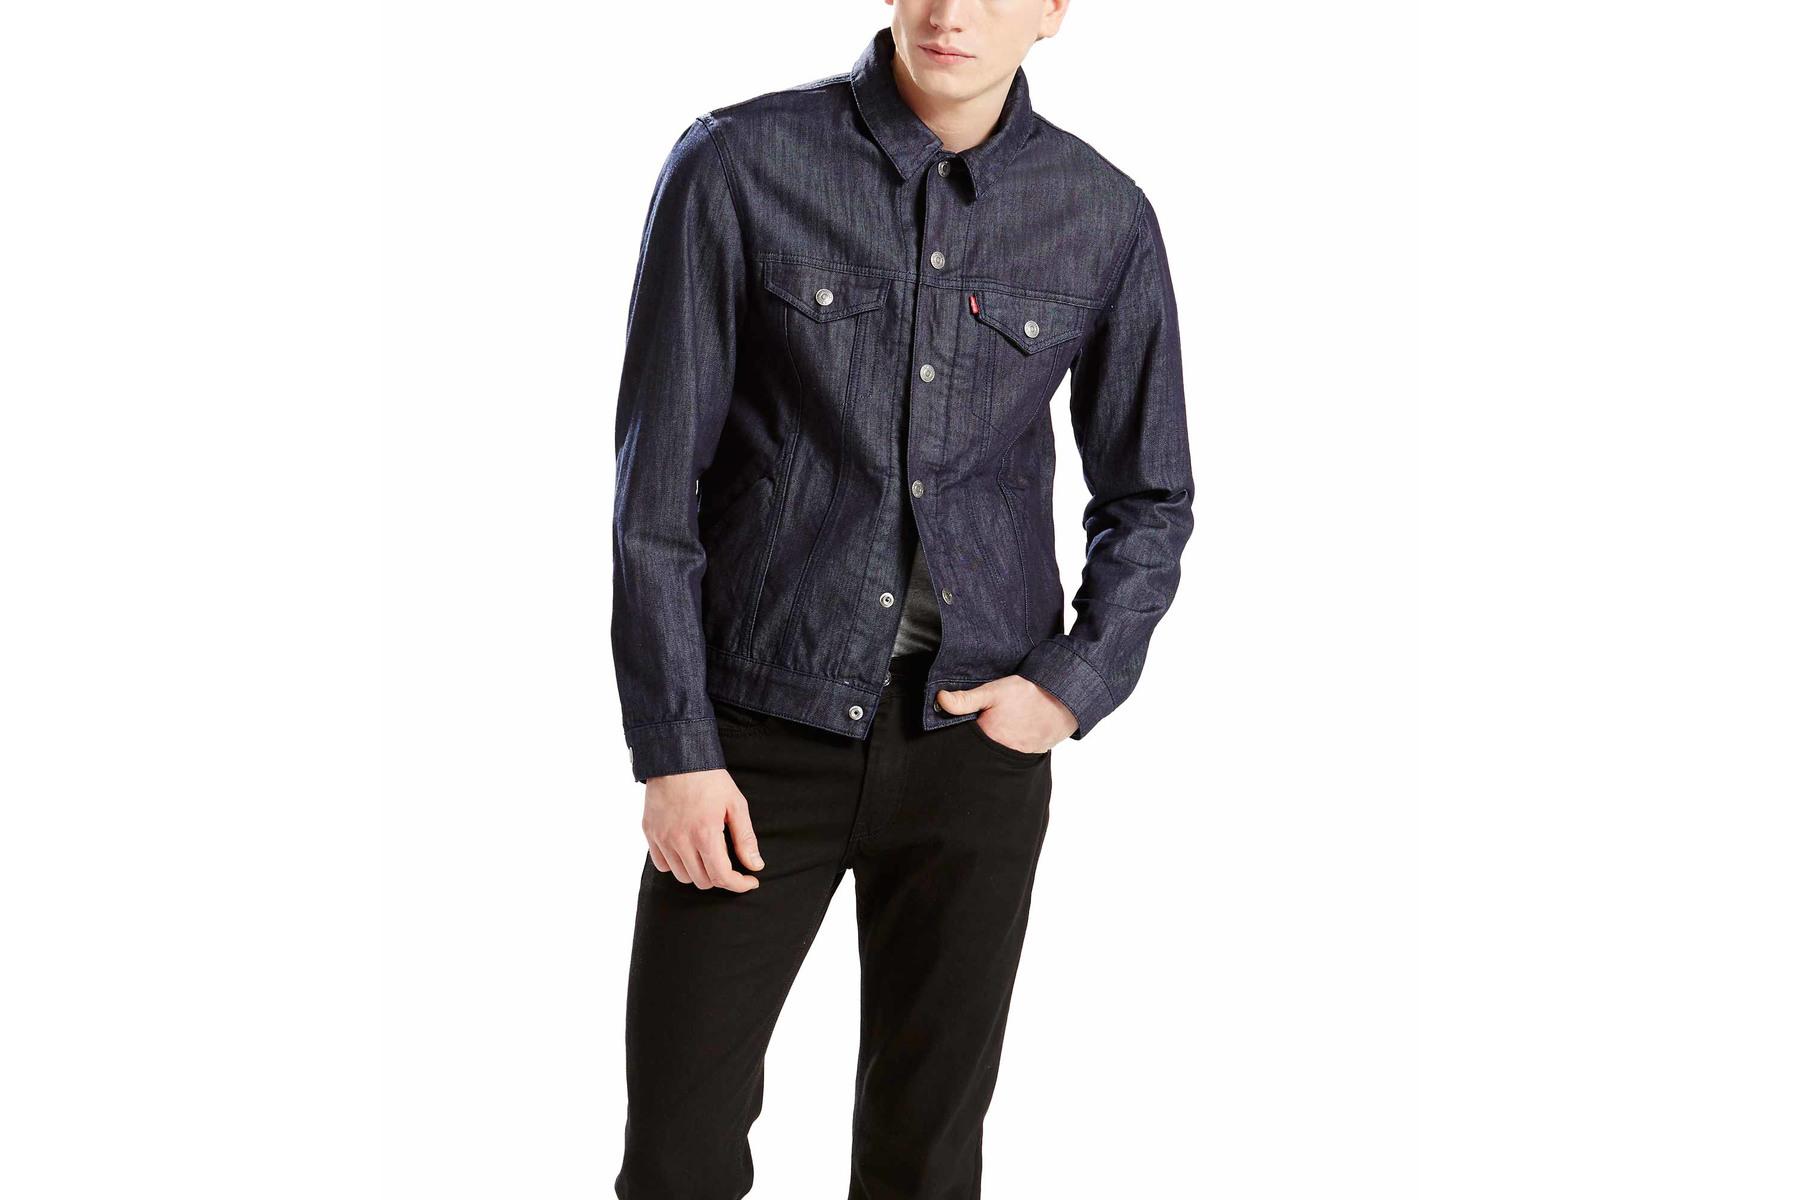 Levis jeansjacke kaufen